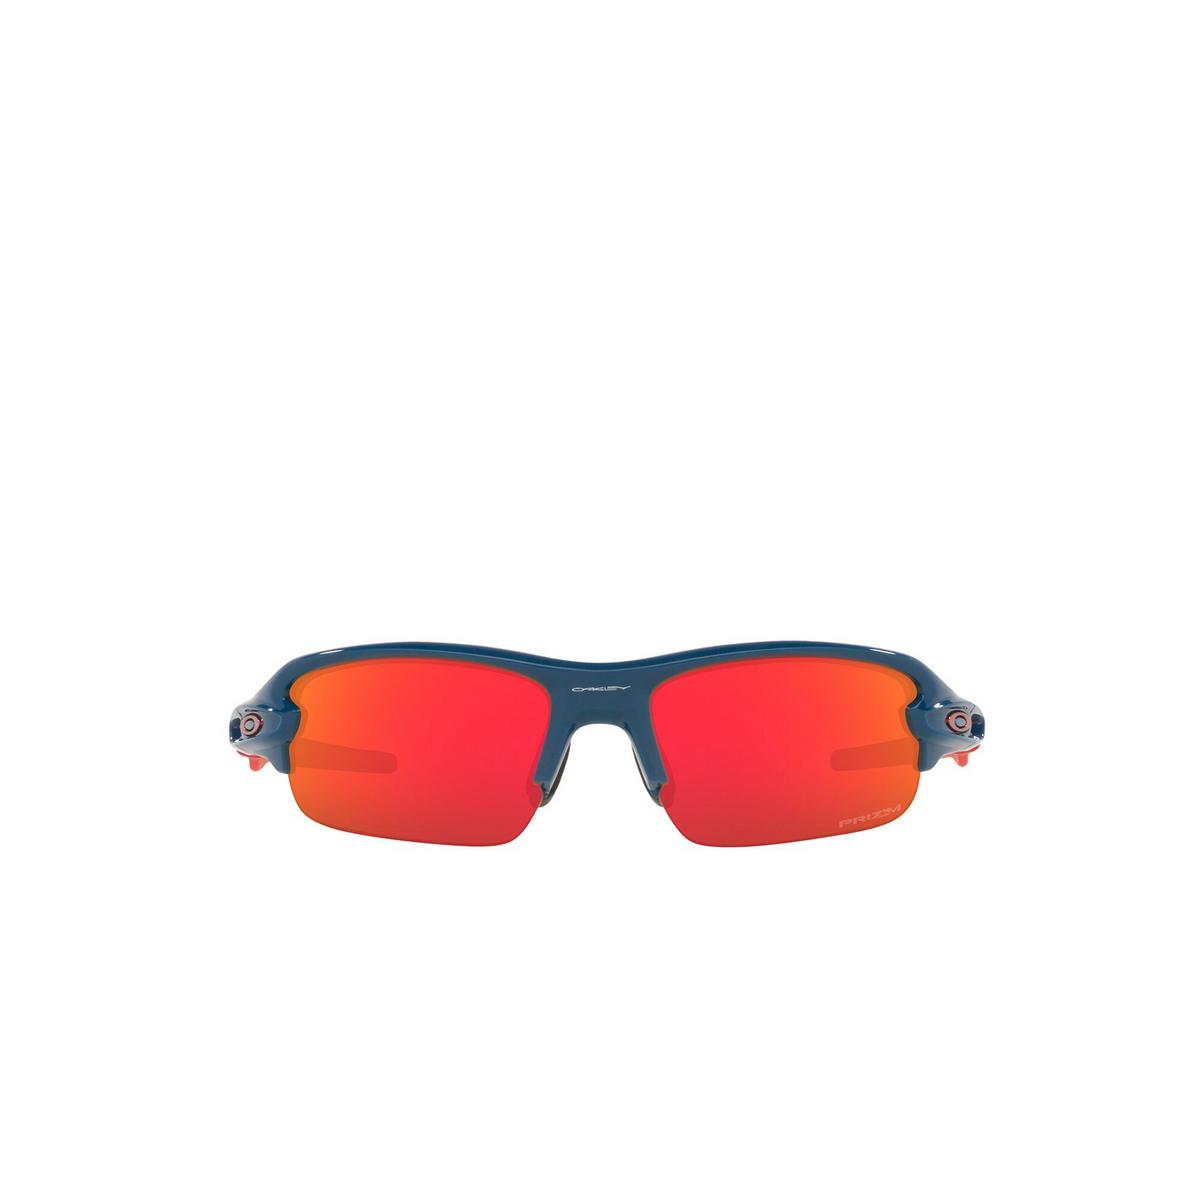 Oakley® Rectangle Sunglasses: Flak Xxs OJ9008 color Poseidon 900803 - front view.